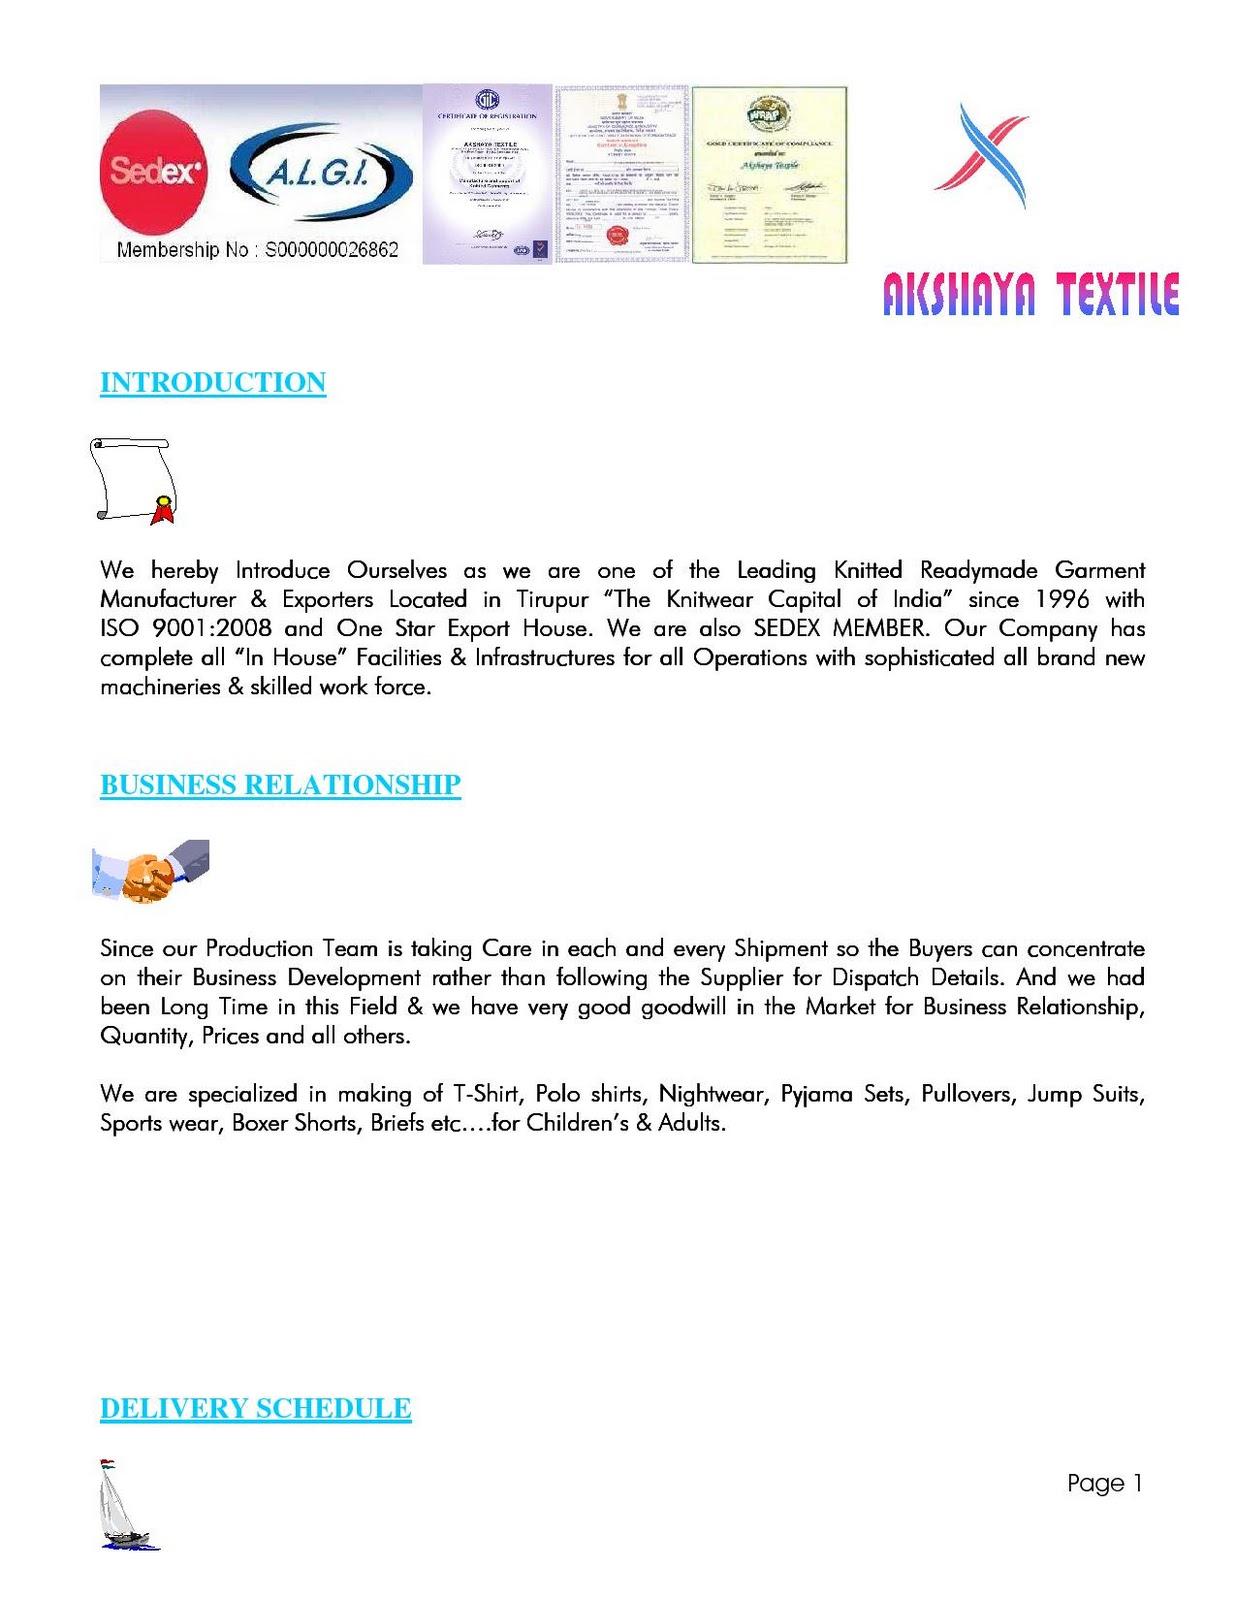 Akshaya Textile: Akshaya Textile - Company Profile